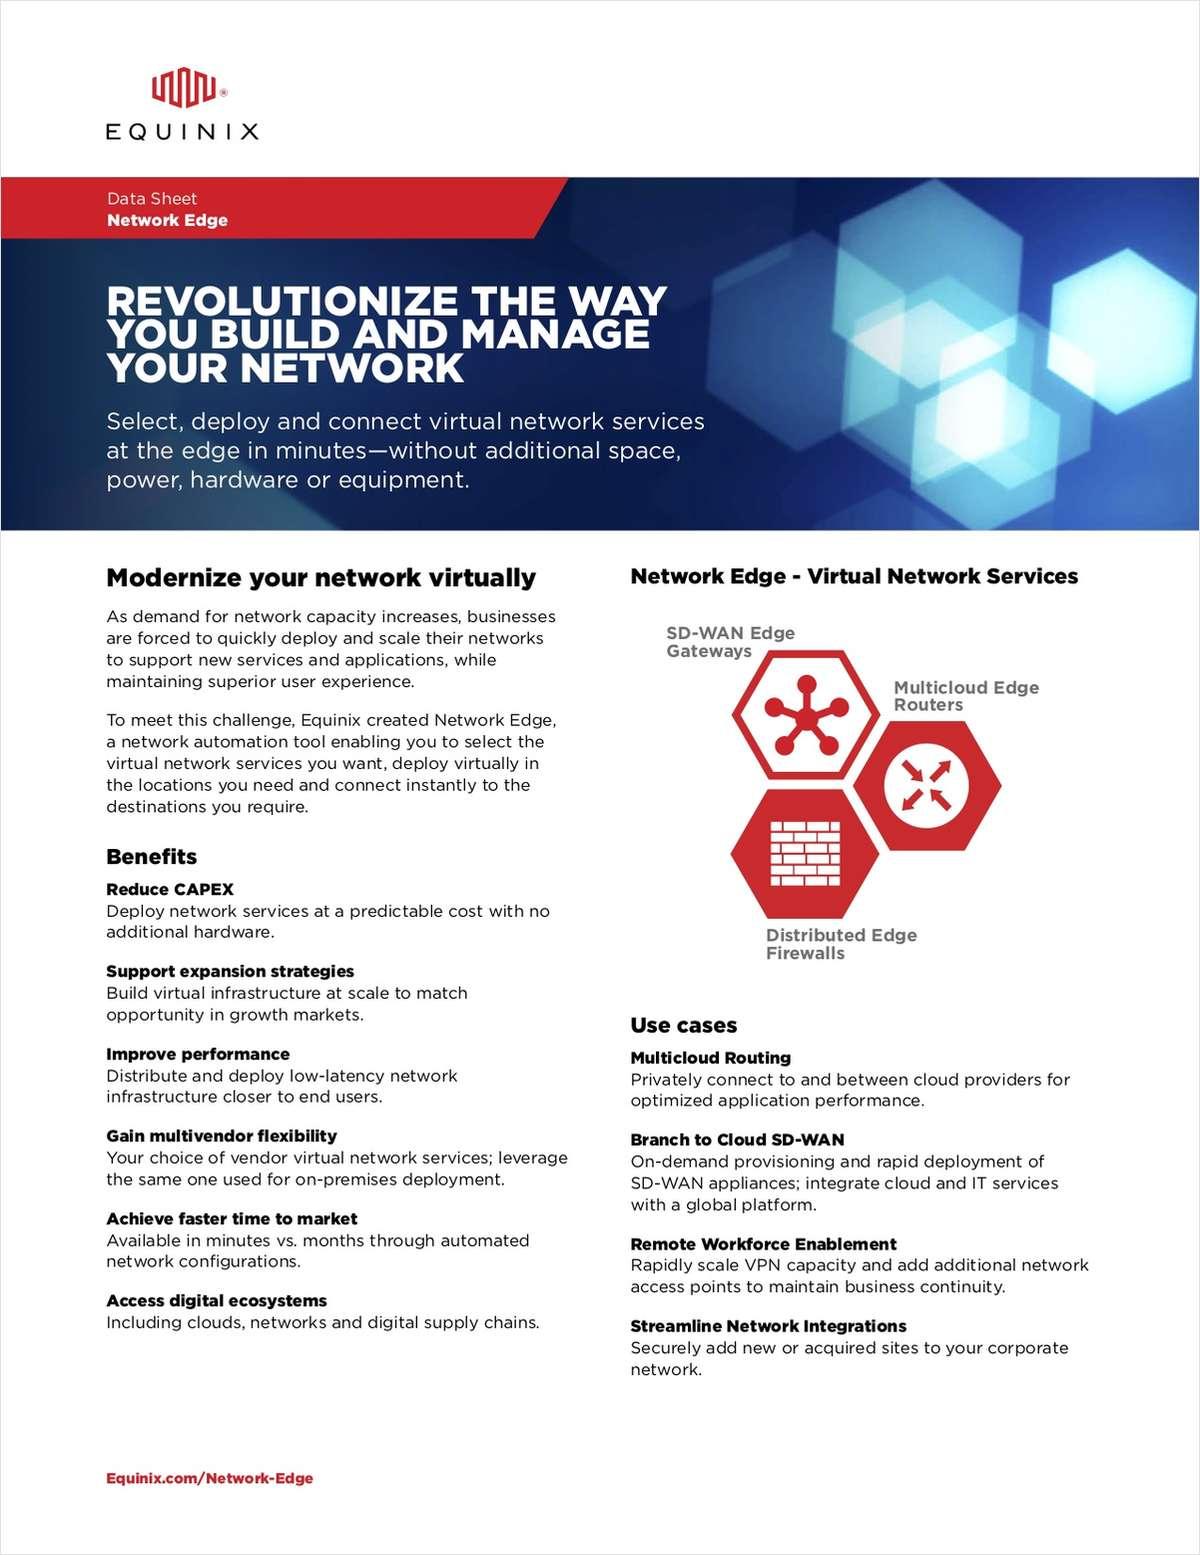 Equinix: Network Edge - Modernize Your Network, Virtually